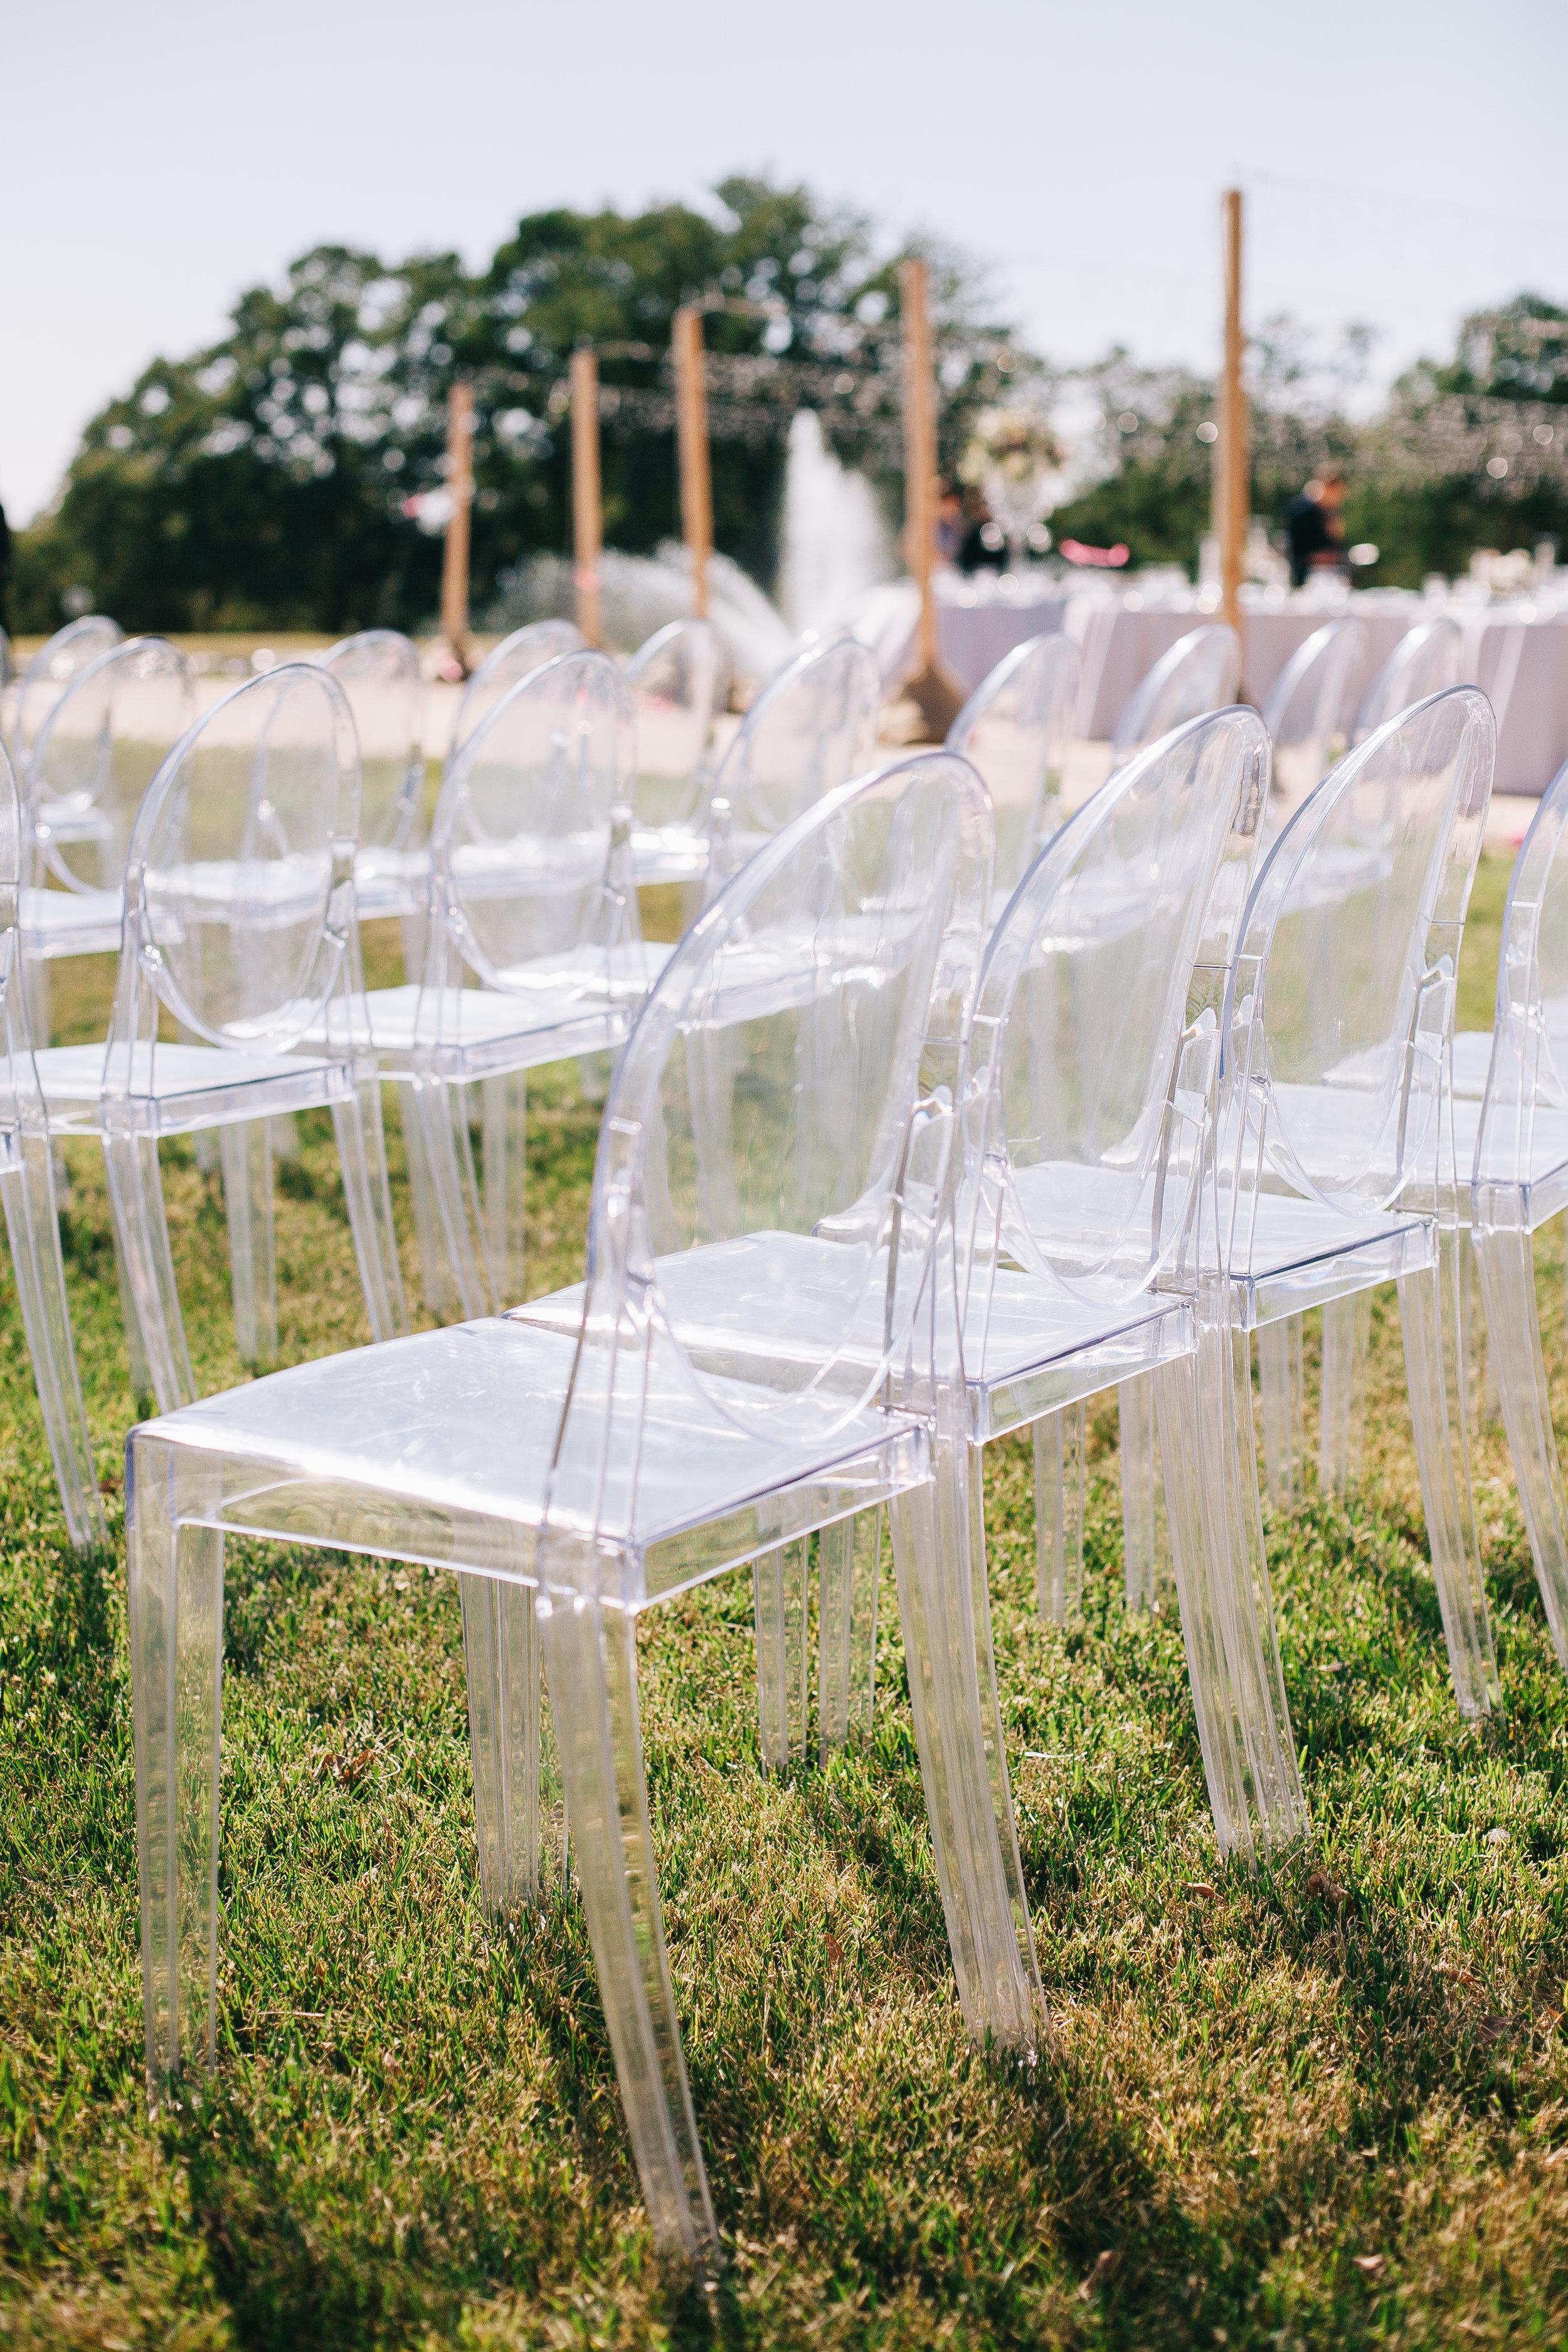 Violette-fleurs-event-design-roseville-anna-perevertaylo-rancho-robles-vinyards-Detail-Beautiful-Decor-Bliss-Florist-ghost-chair.jpg